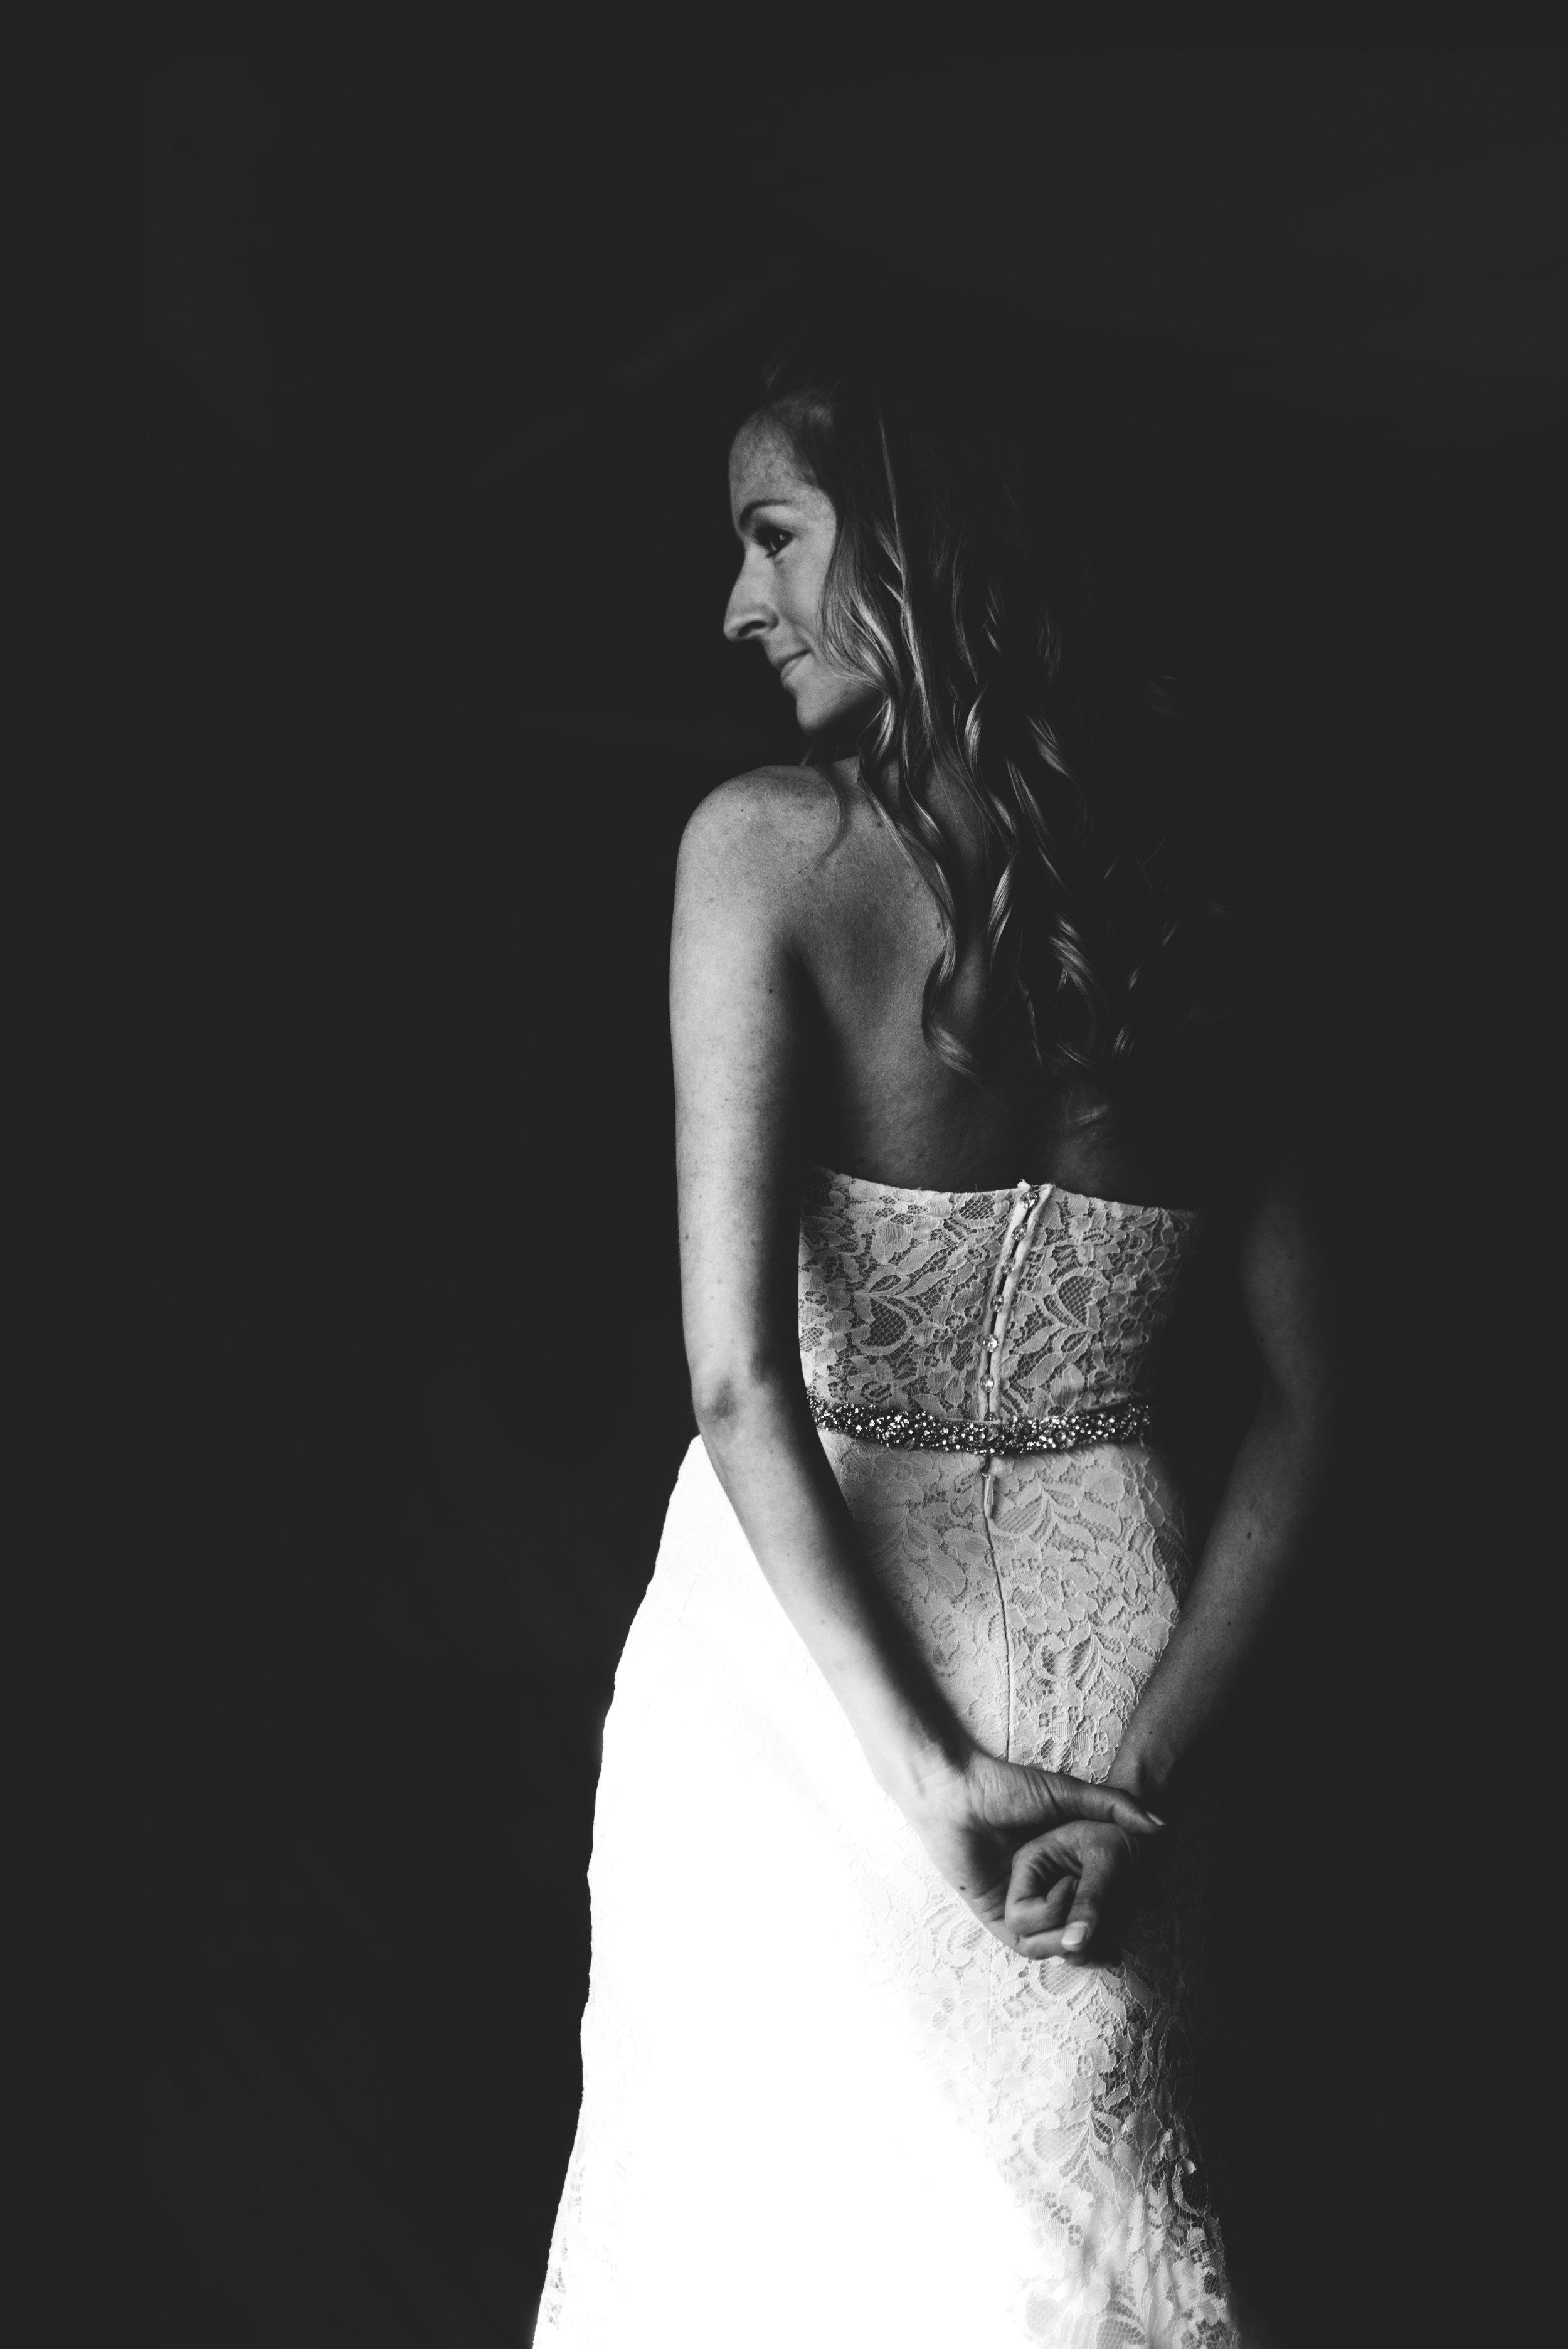 Des-Moines-Wedding-Blog-Kayla-Jeff-1.jpg